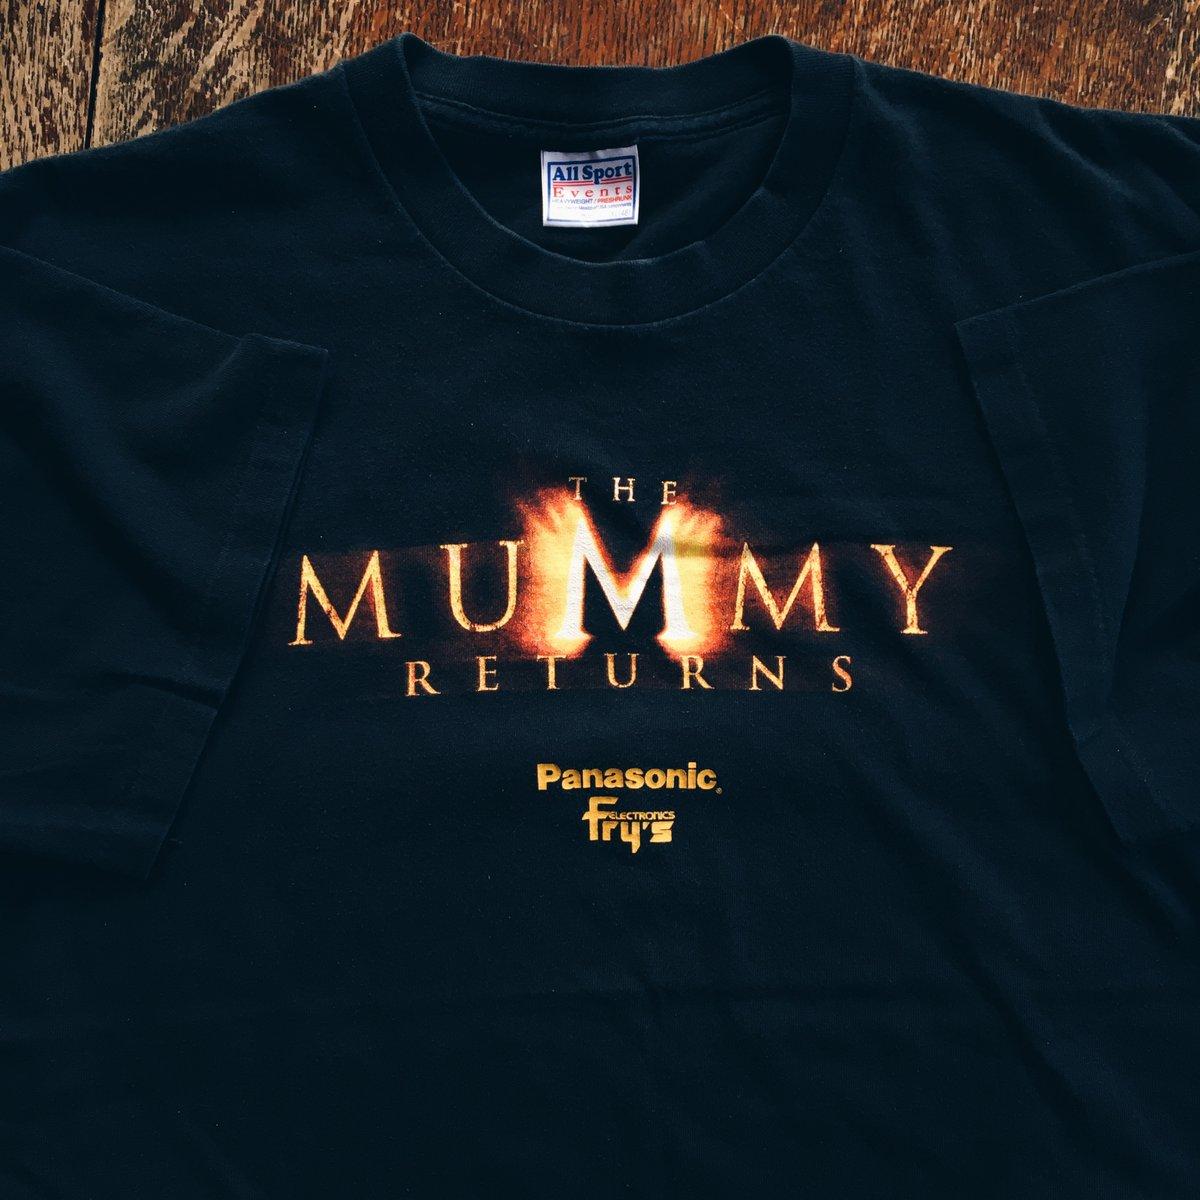 Image of Original 2001 The Mummy Returns Movie Promo Tee.